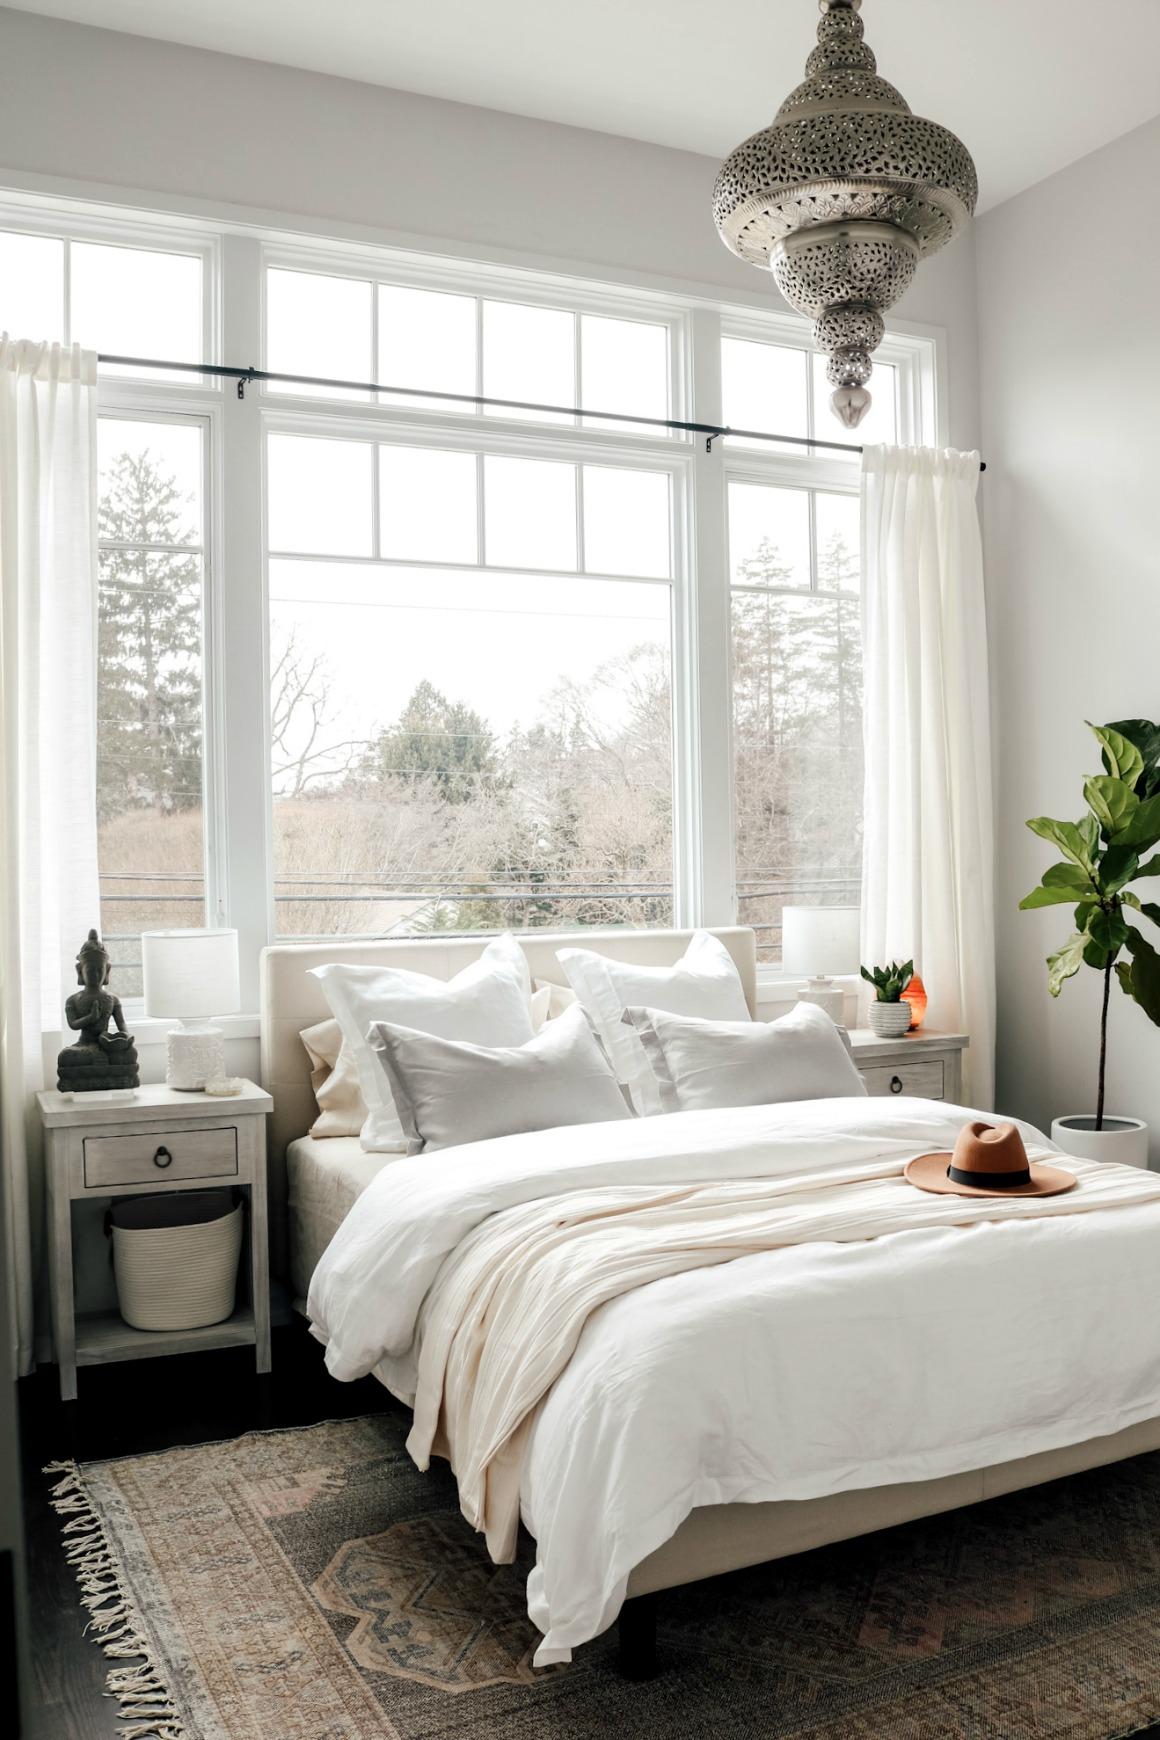 White Boho Master Bedroom Makeover - Nesting With Grace on Boho Master Bedroom Ideas  id=36164